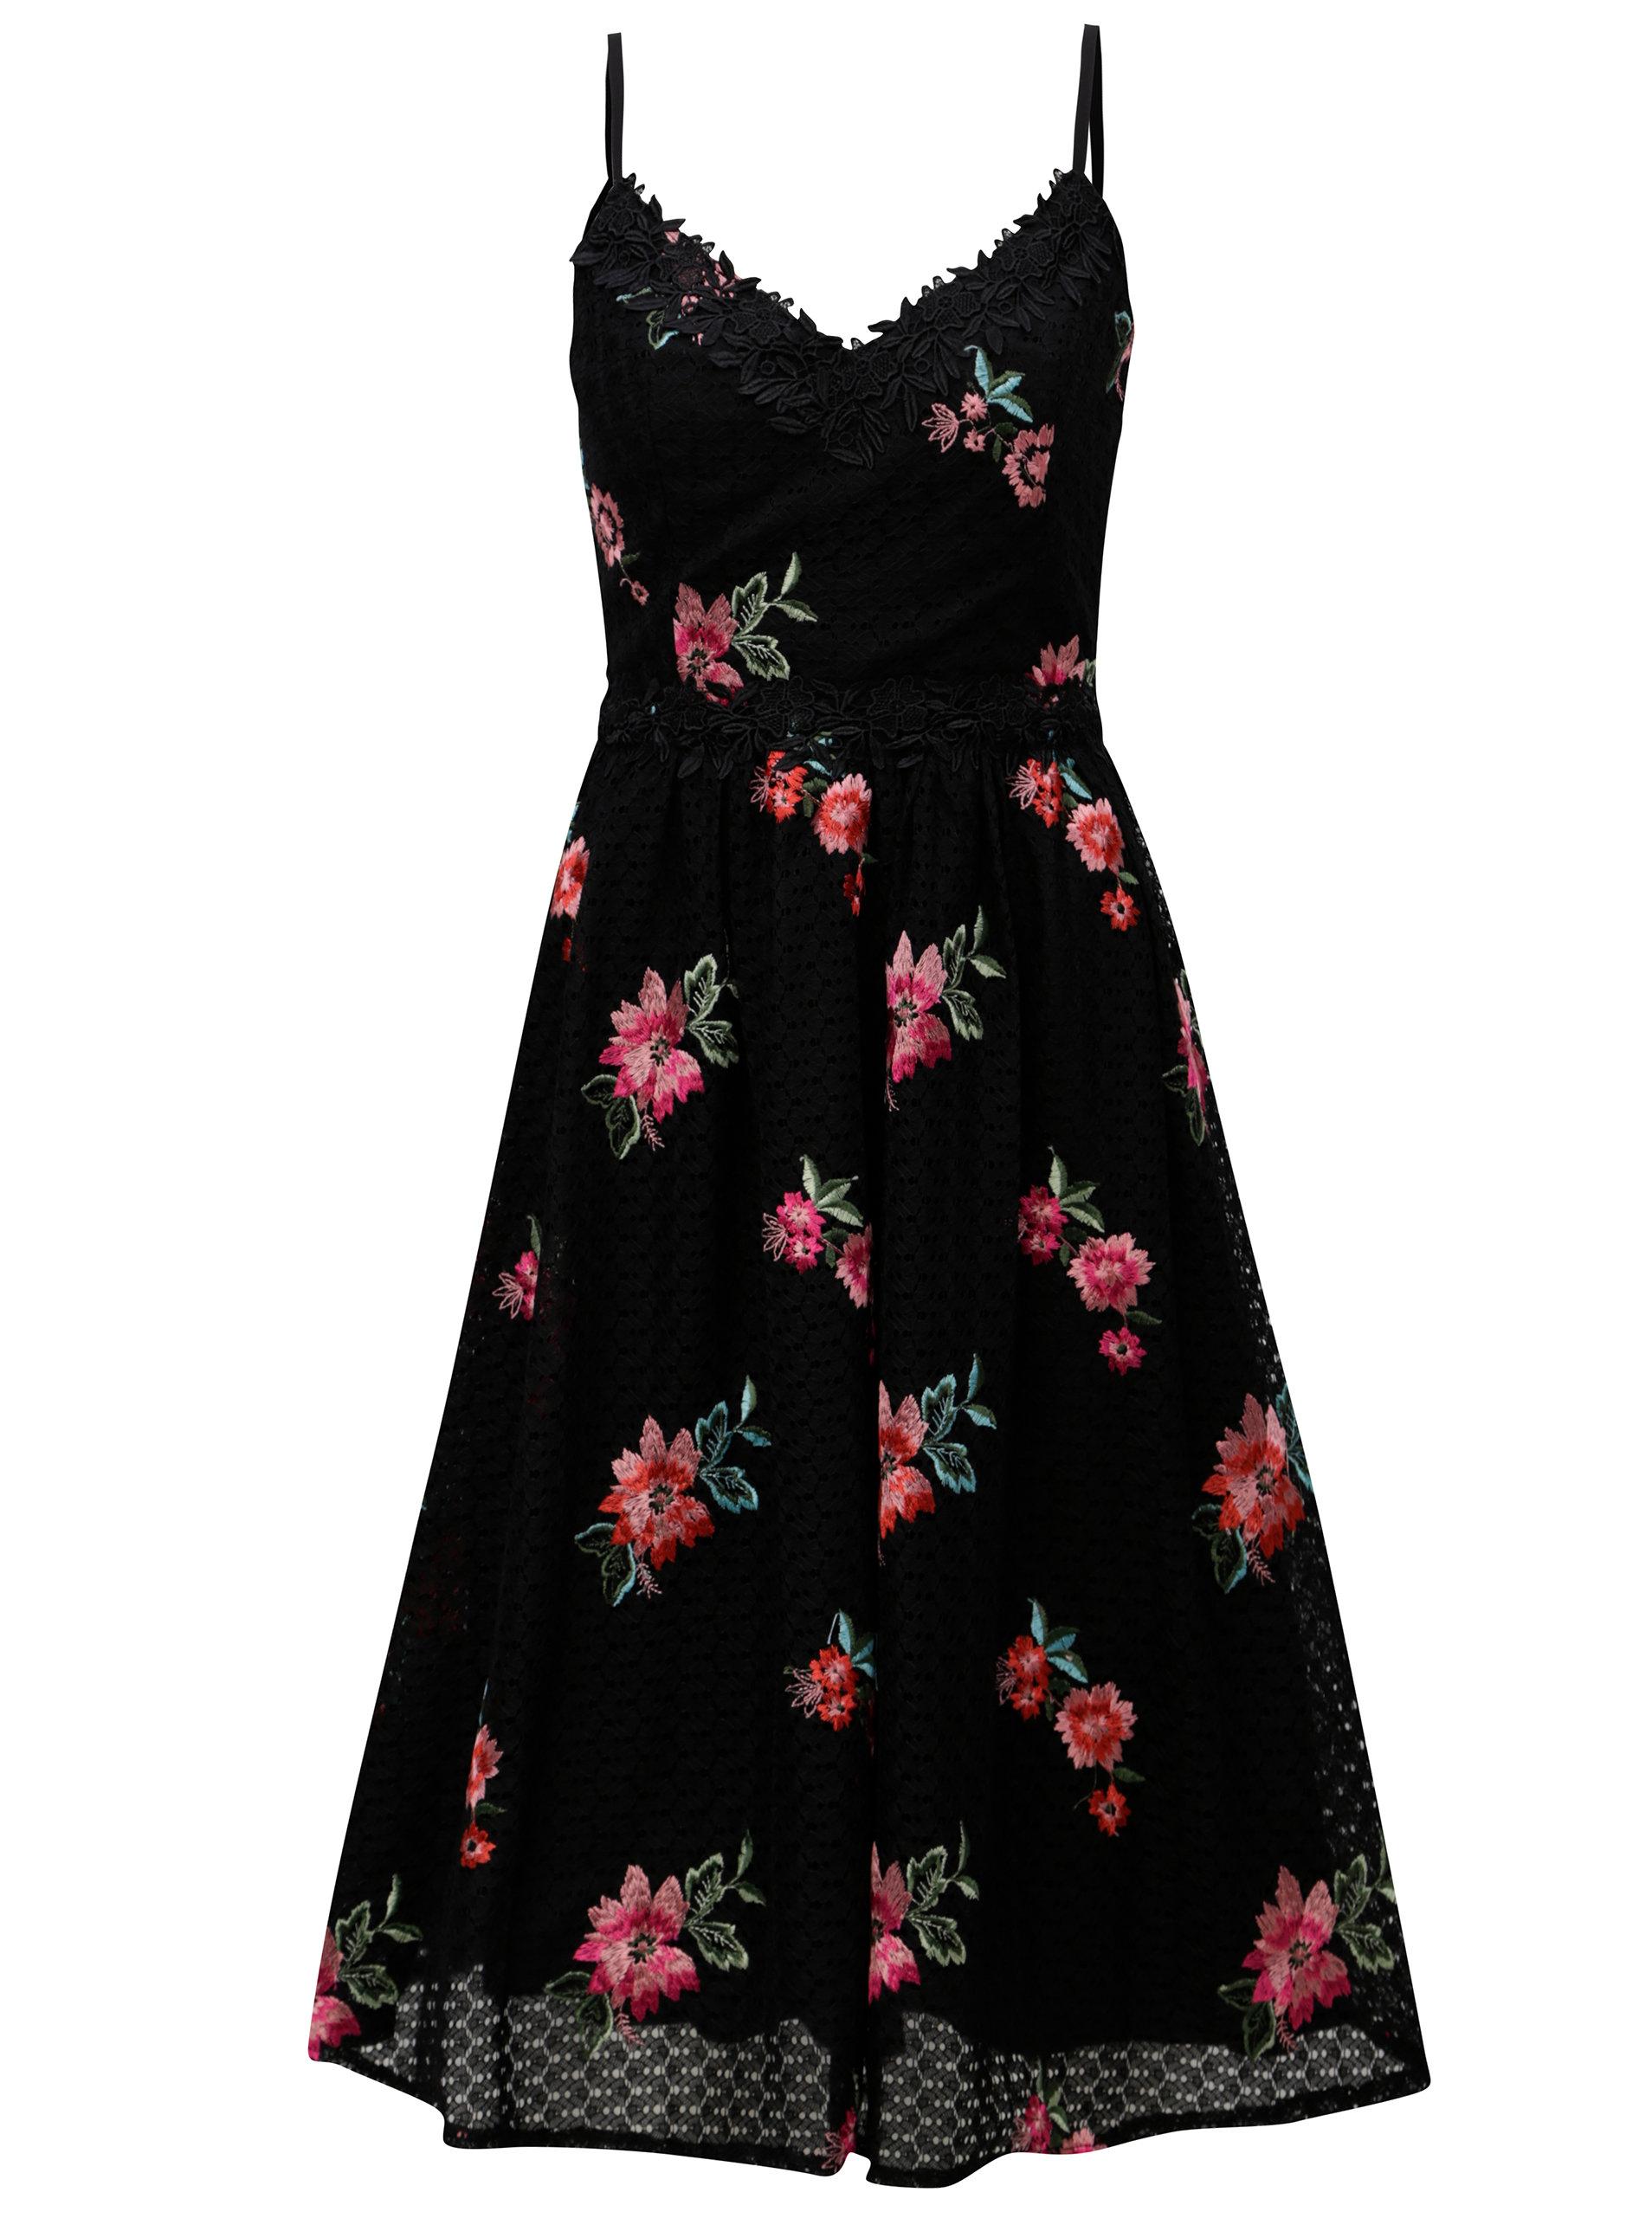 ae69a21e9705 Čierne čipkované šaty s výšivvkami Little Mistress ...